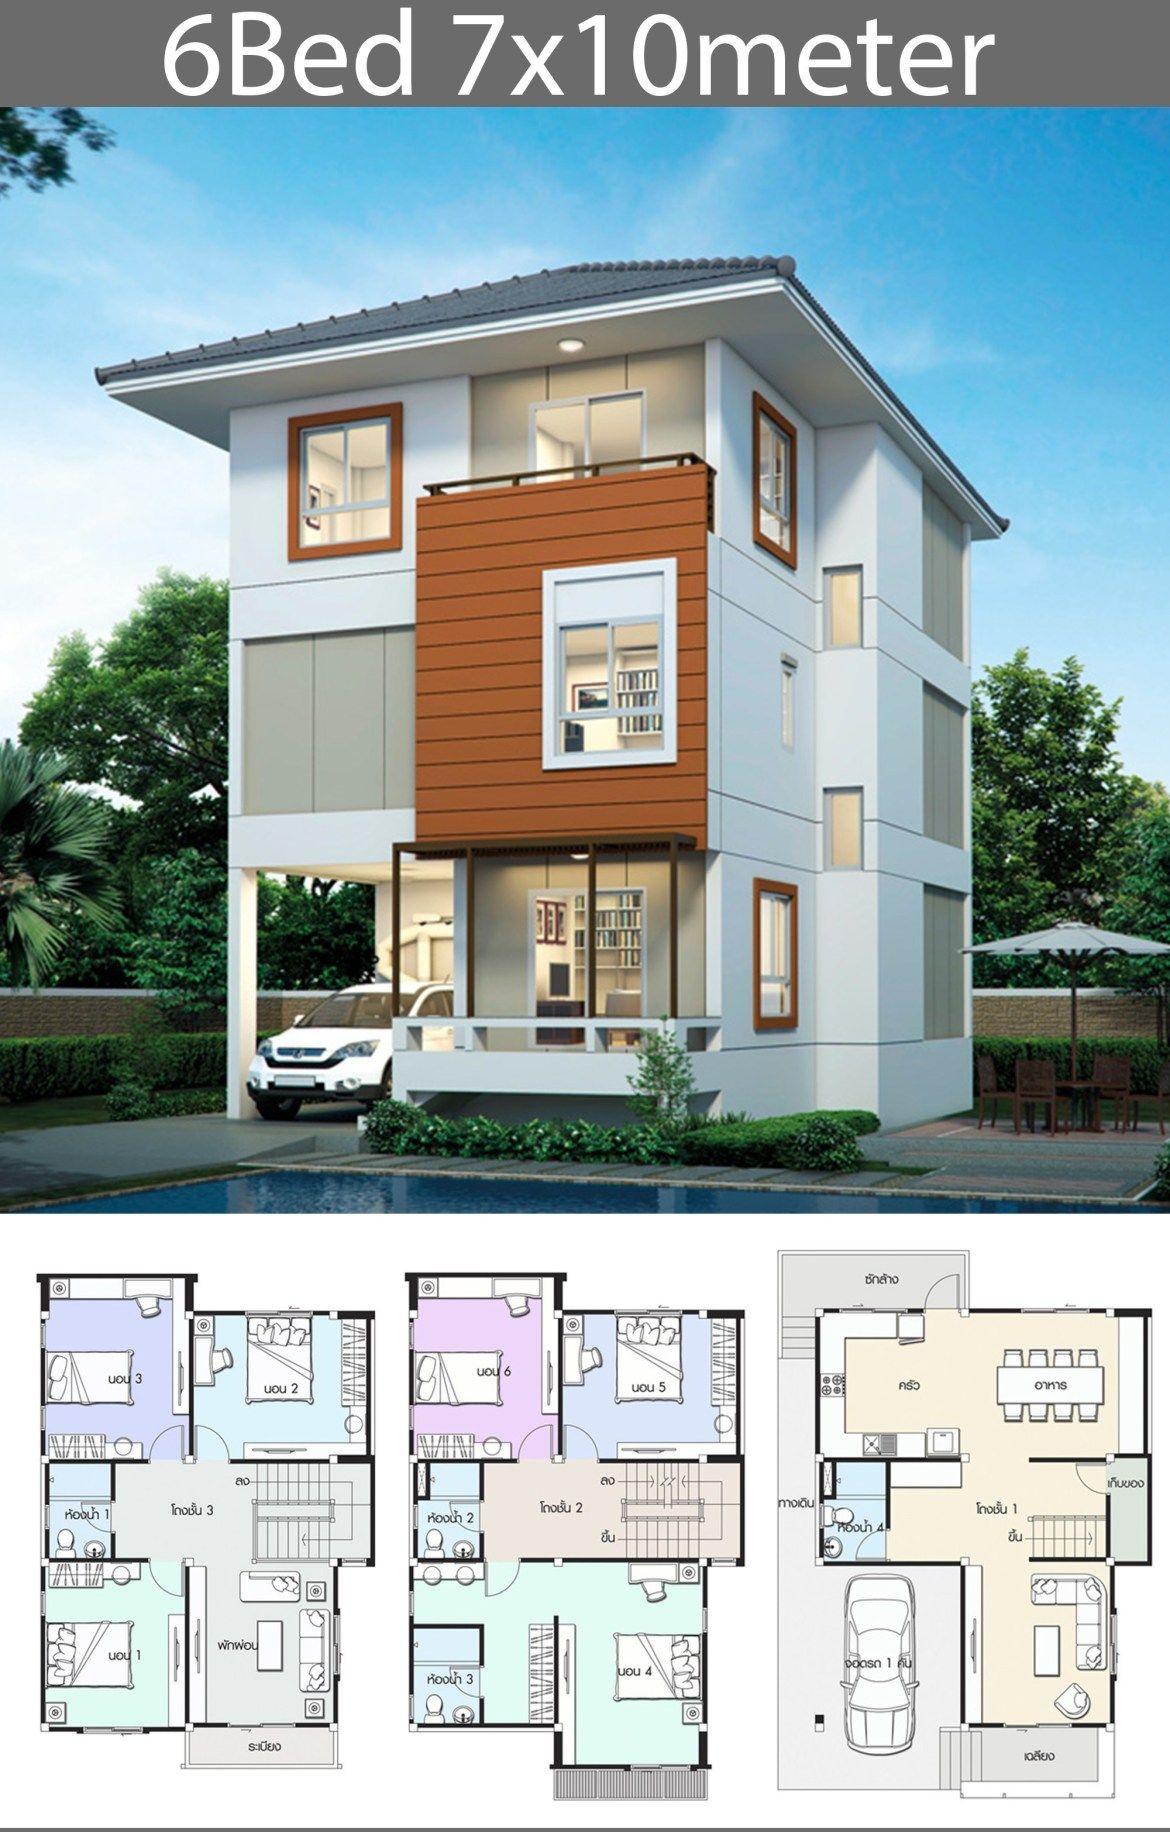 5 Ideas Home Design Plan 7x10m Samphoas Plansearch Town House Floor Plan House Construction Plan Duplex House Design